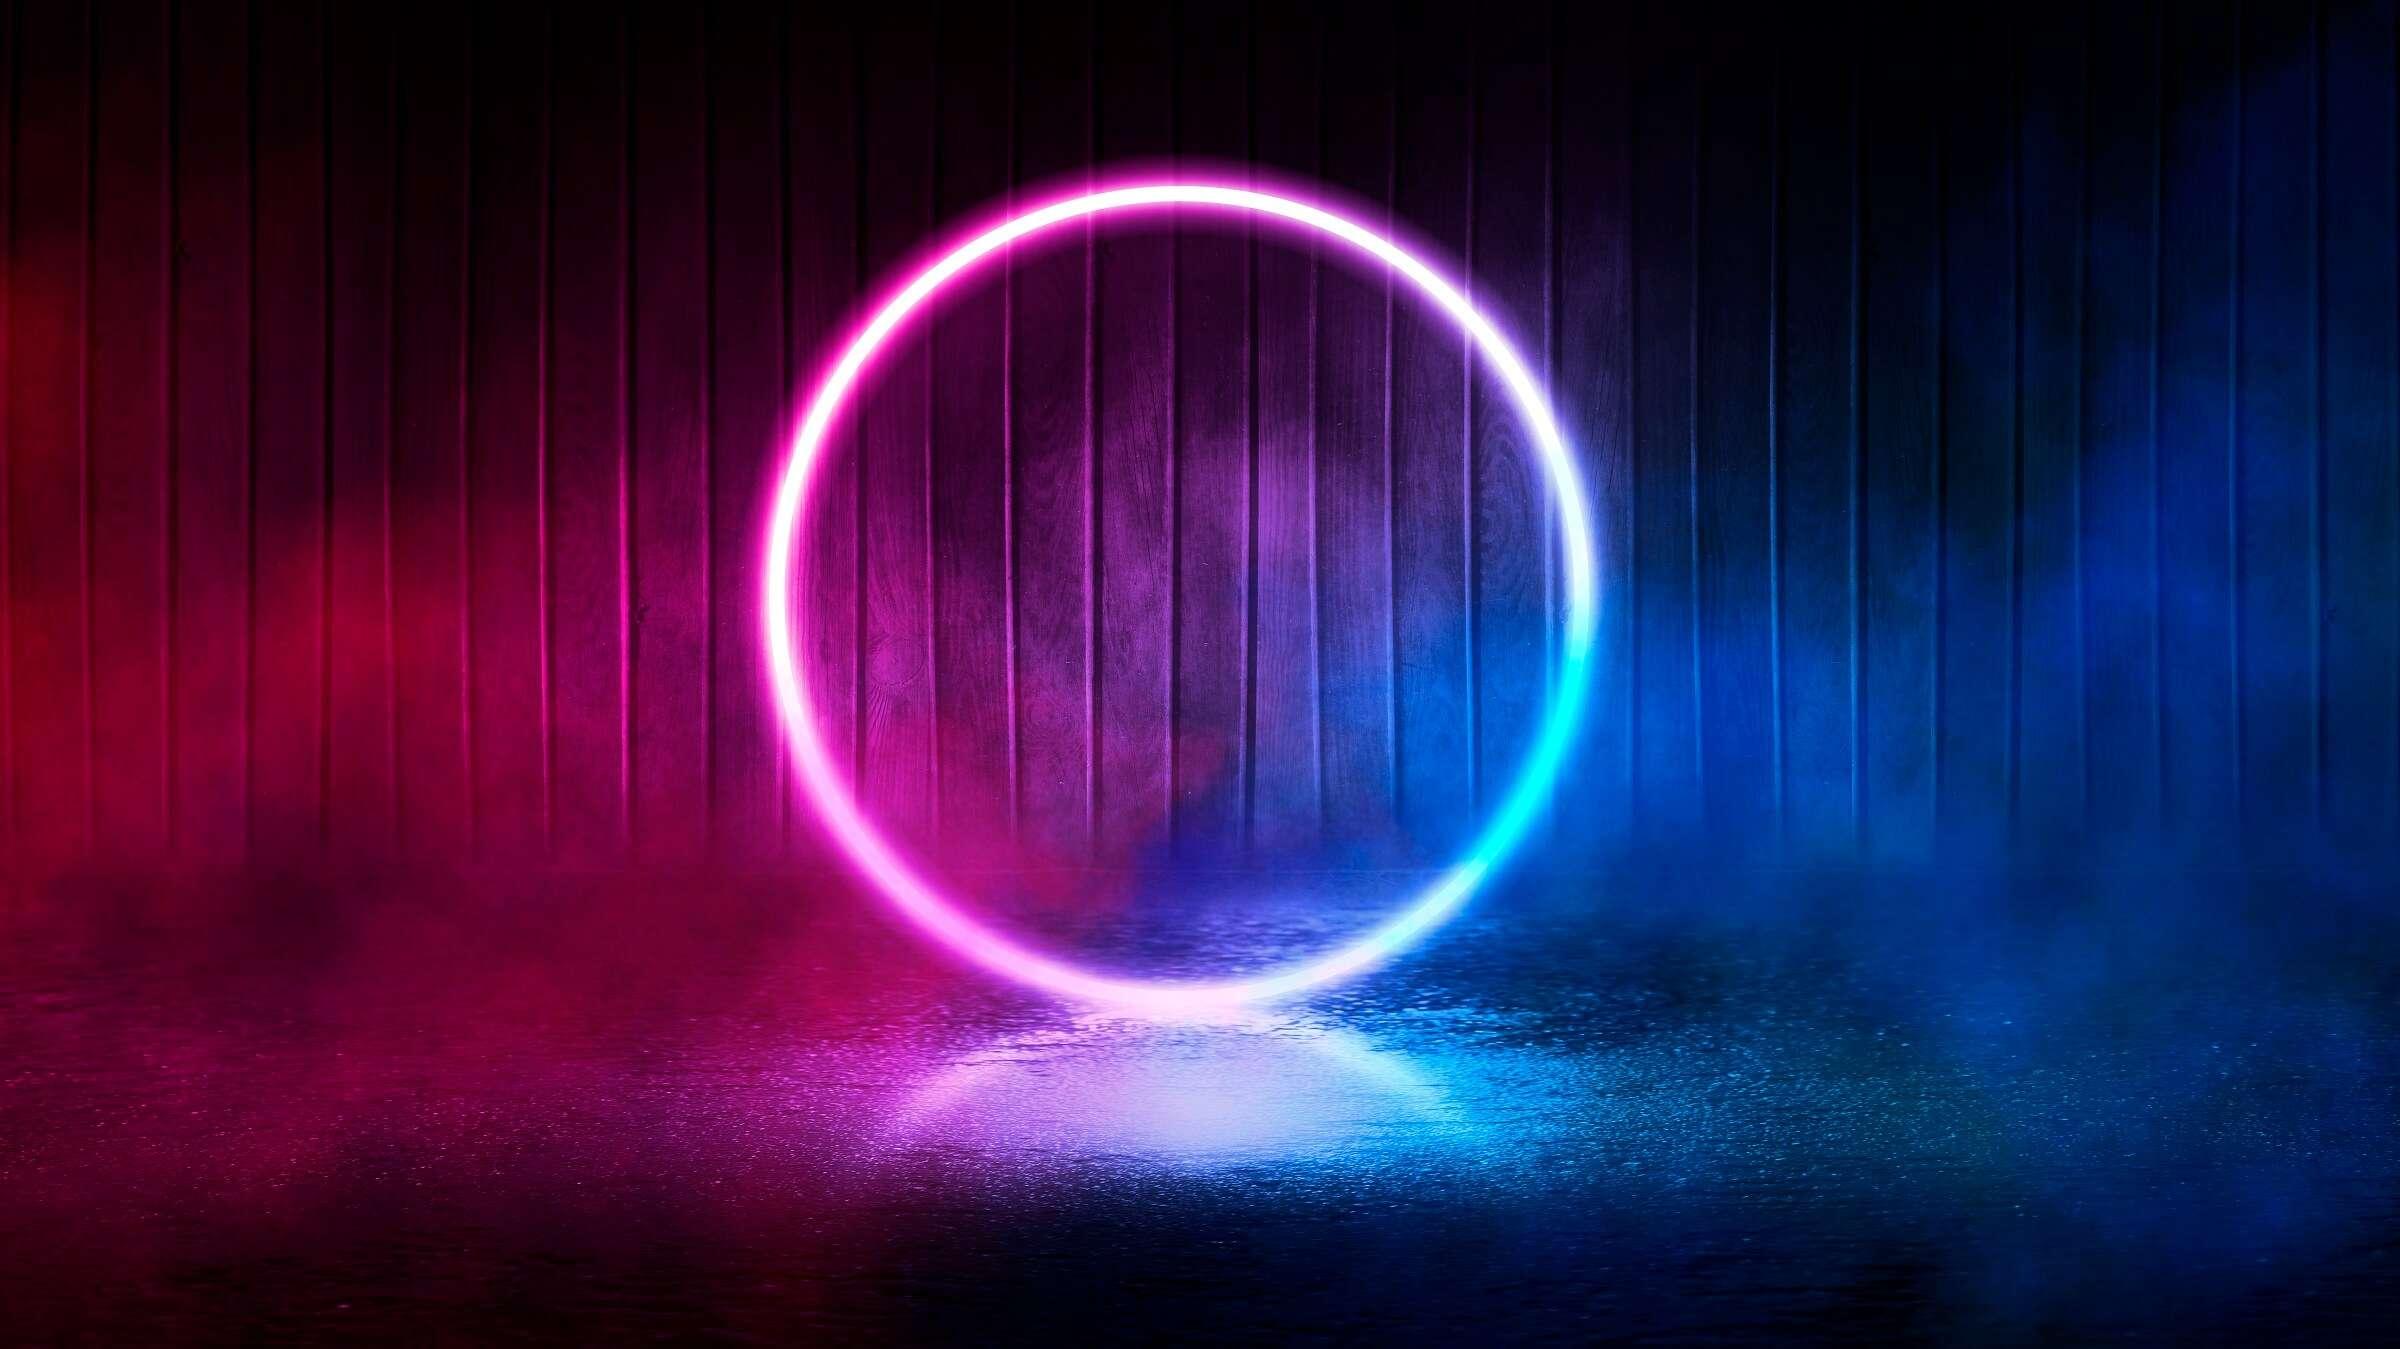 purple blue neon circle design Επαγγελματικά Σεμινάρια Adobe After Effects